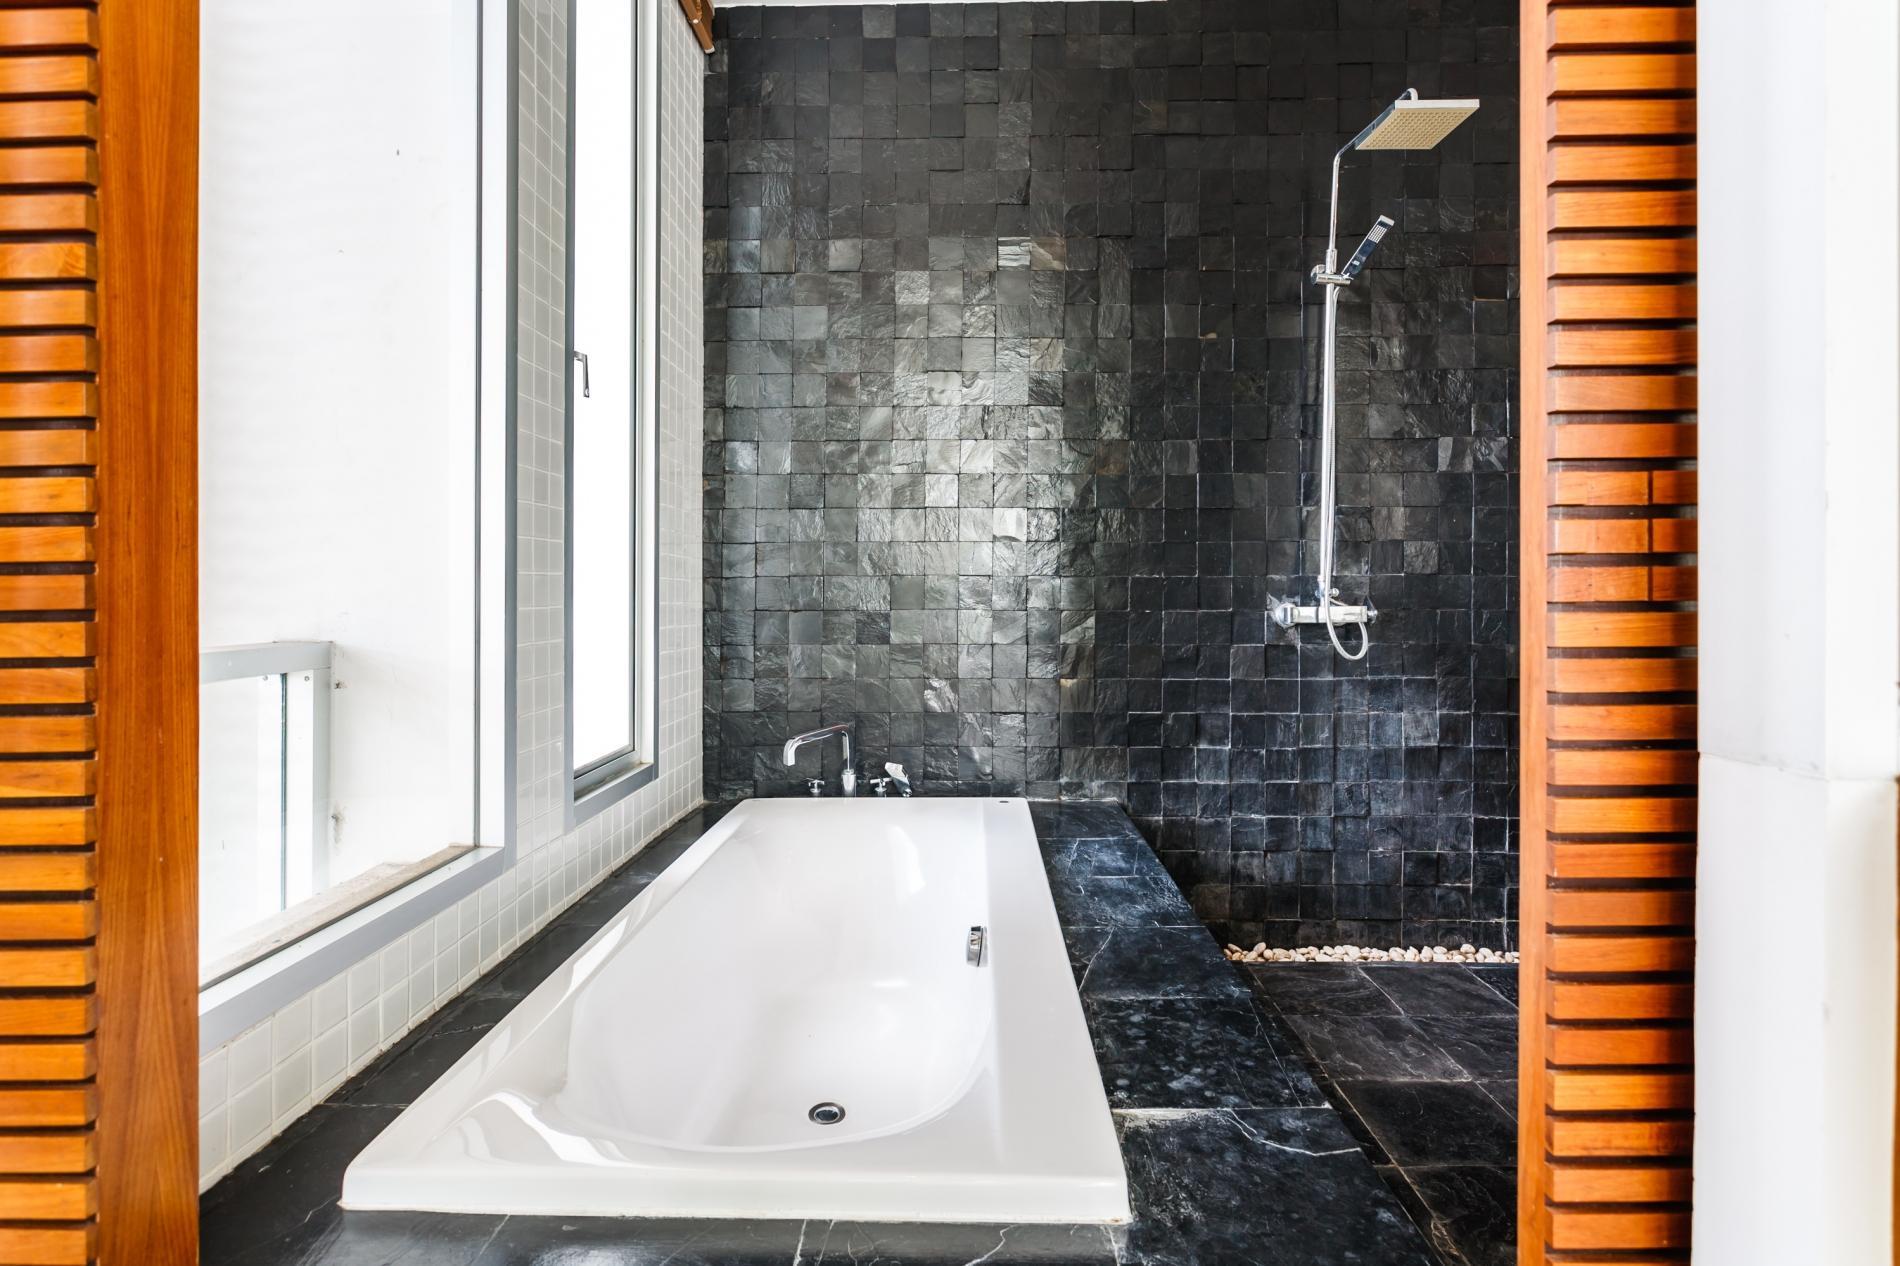 Apartment The Quarter 301 - Luxury Surin 3 bedroom apartment private pool photo 20401872